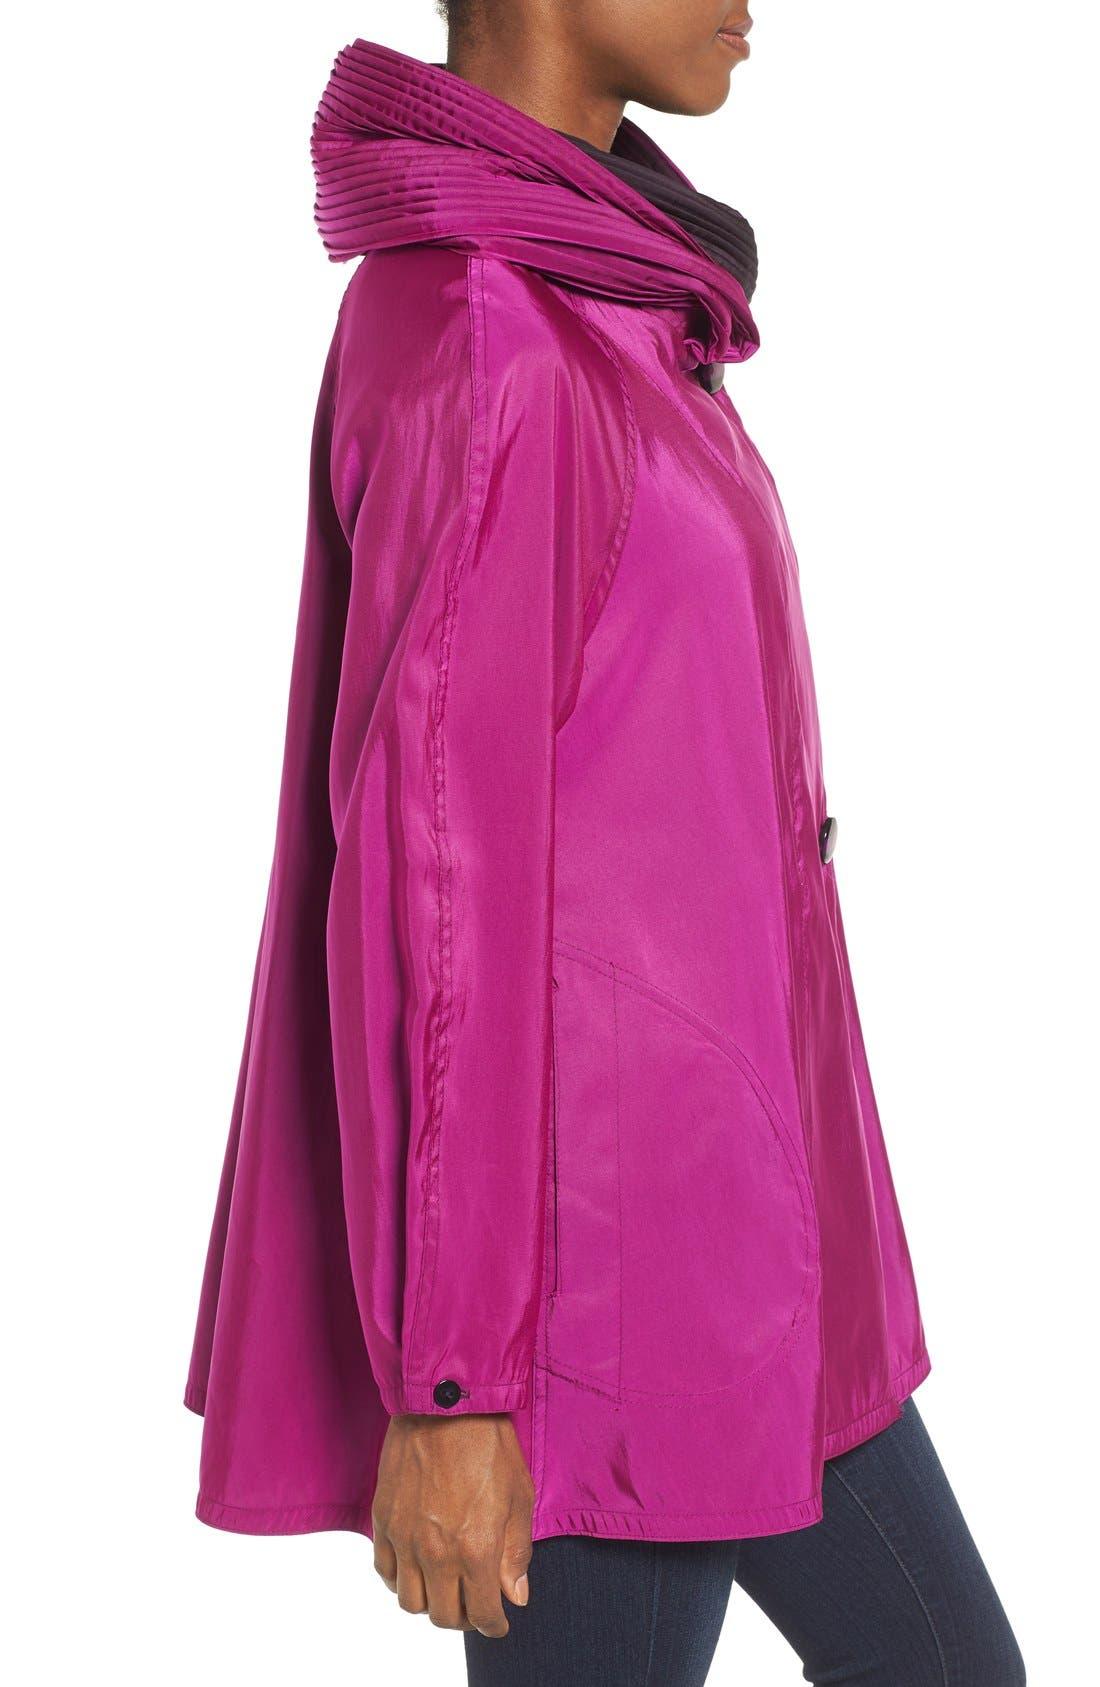 'Mini Donatella' Reversible Pleat Hood Packable Travel Coat,                             Alternate thumbnail 43, color,